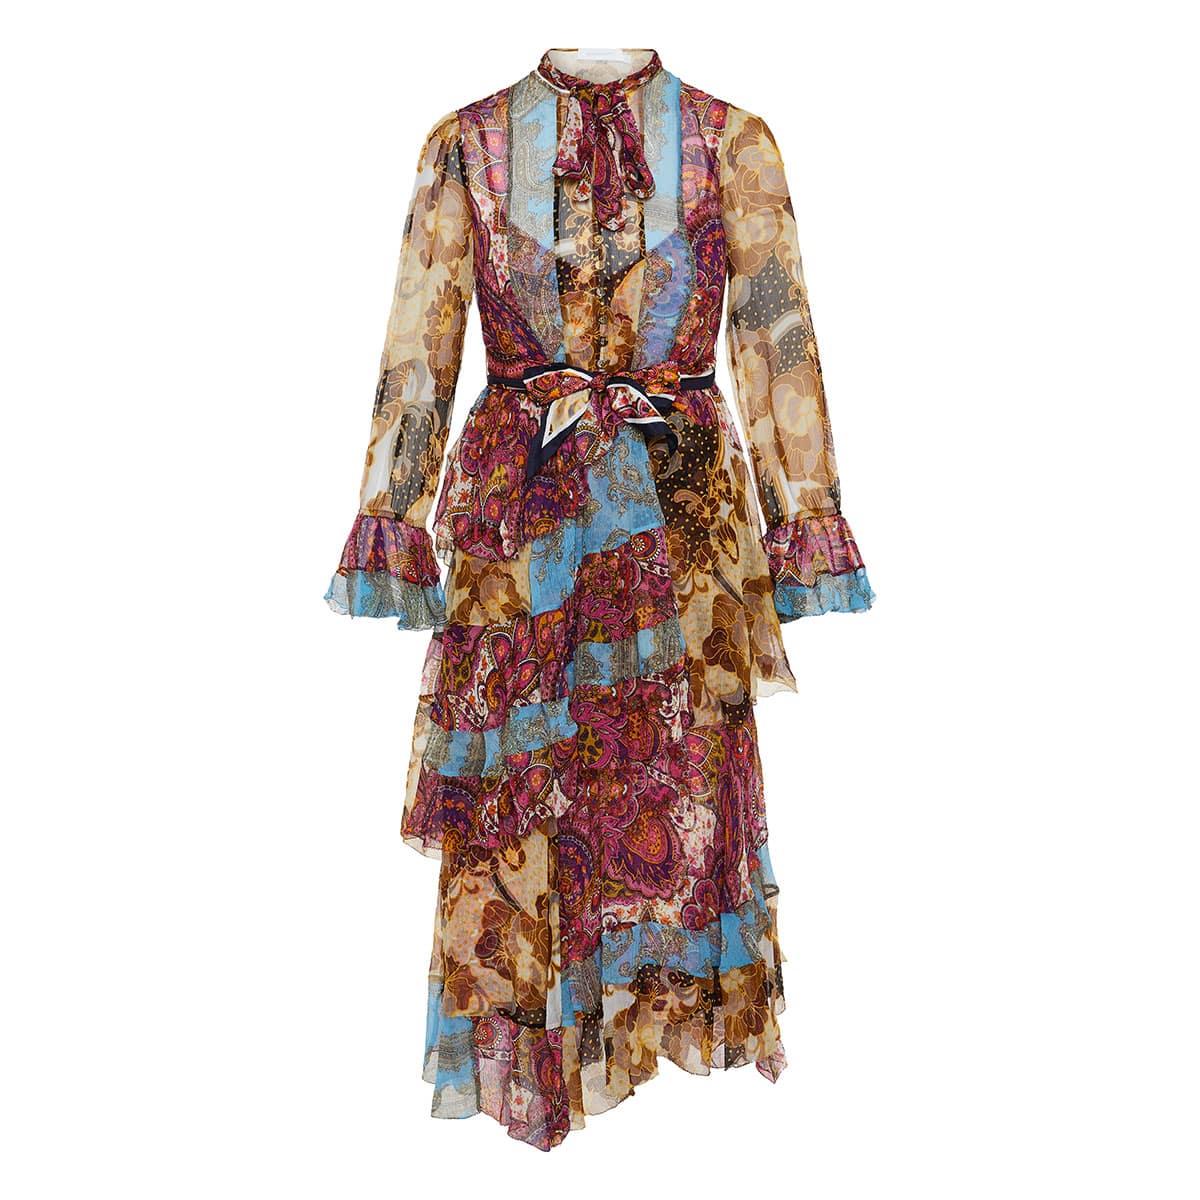 Fiesta Flounce printed tiered midi dress